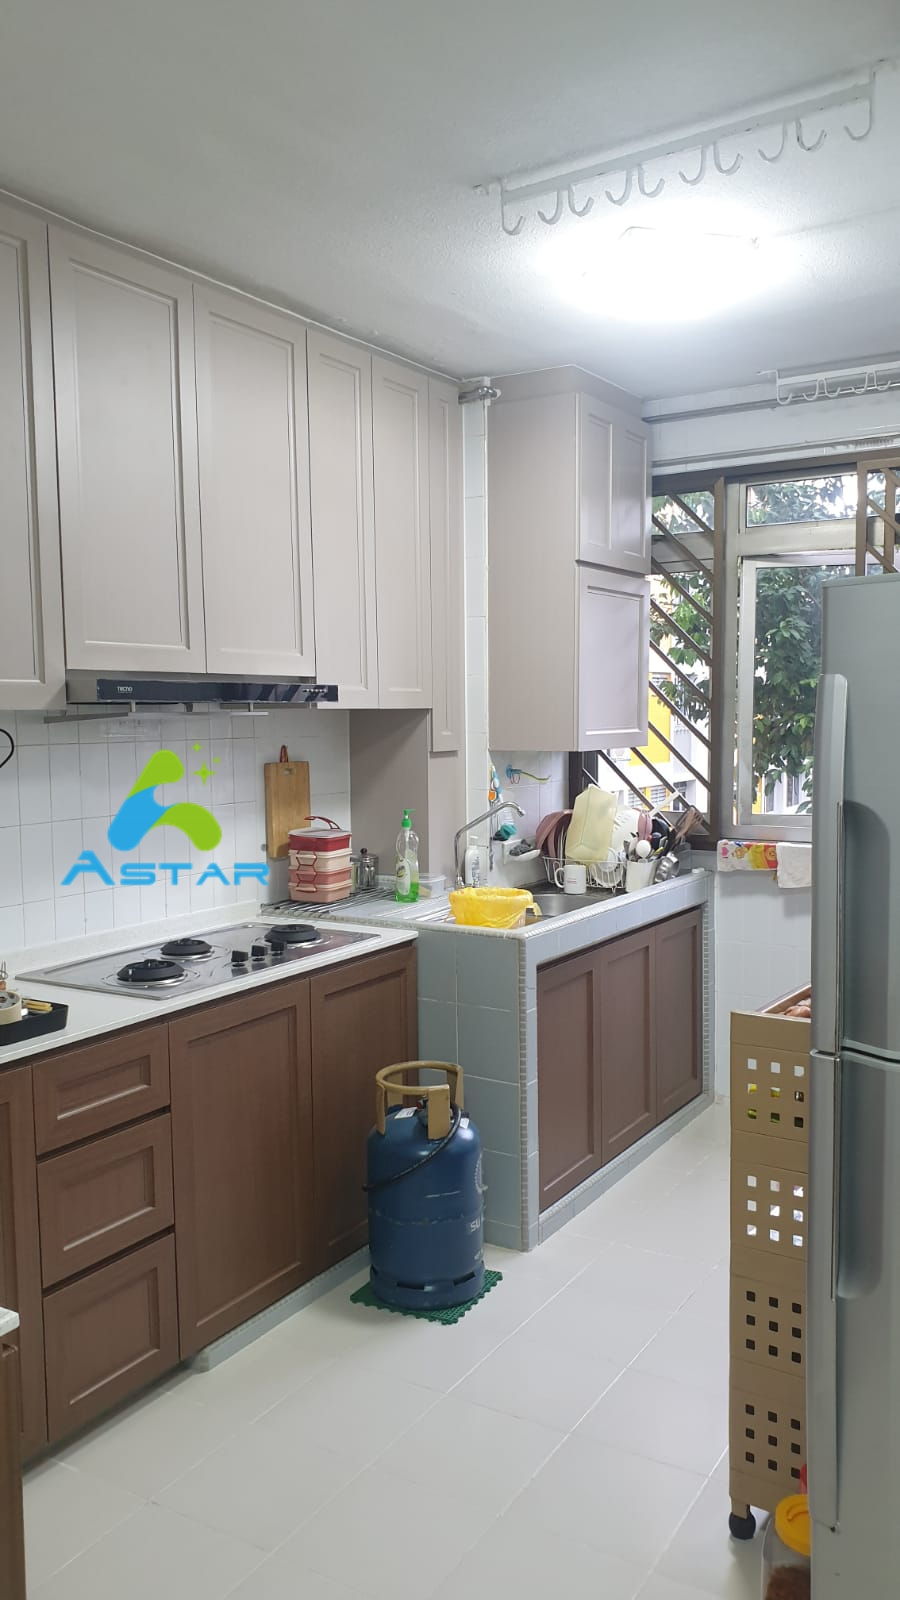 a star furnishing projects Blk 816 Yishun St 81 S 760816 4